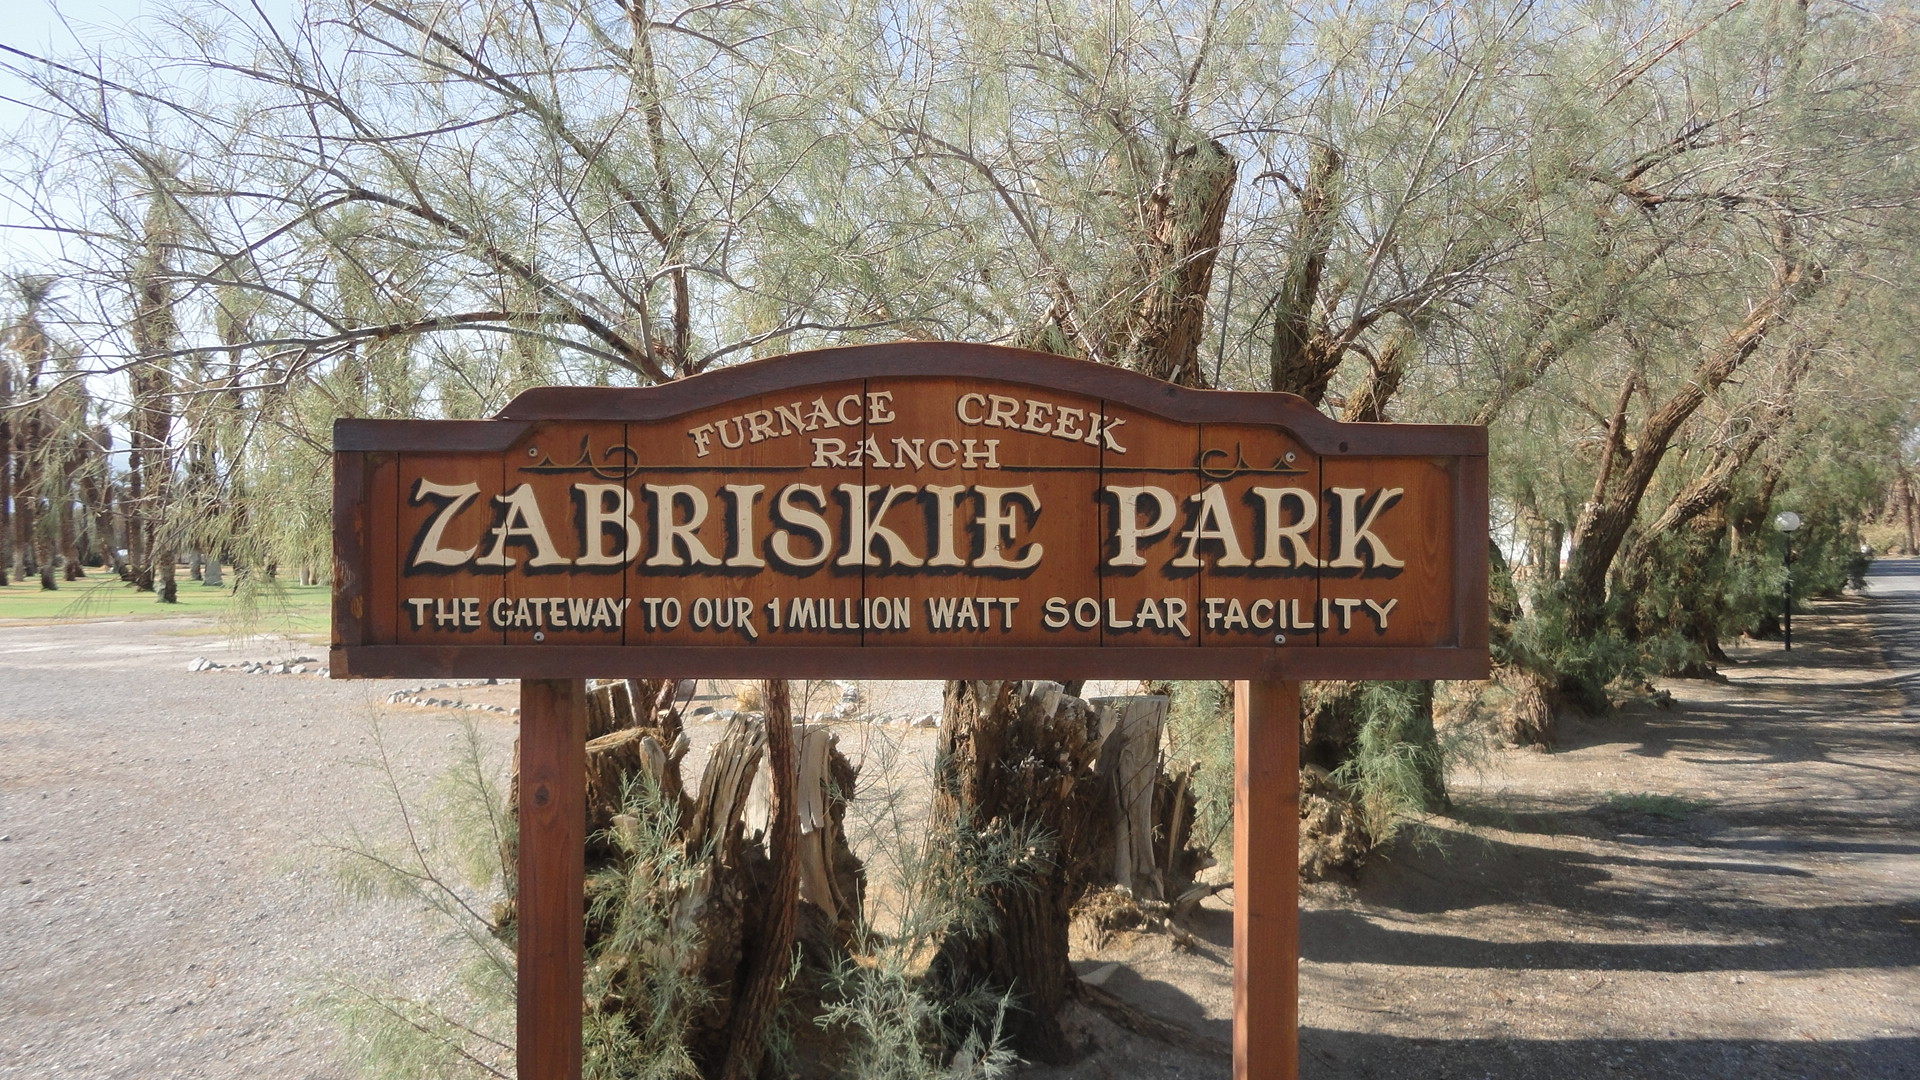 Dag 11 Bishop Furnace Creek South West Usa